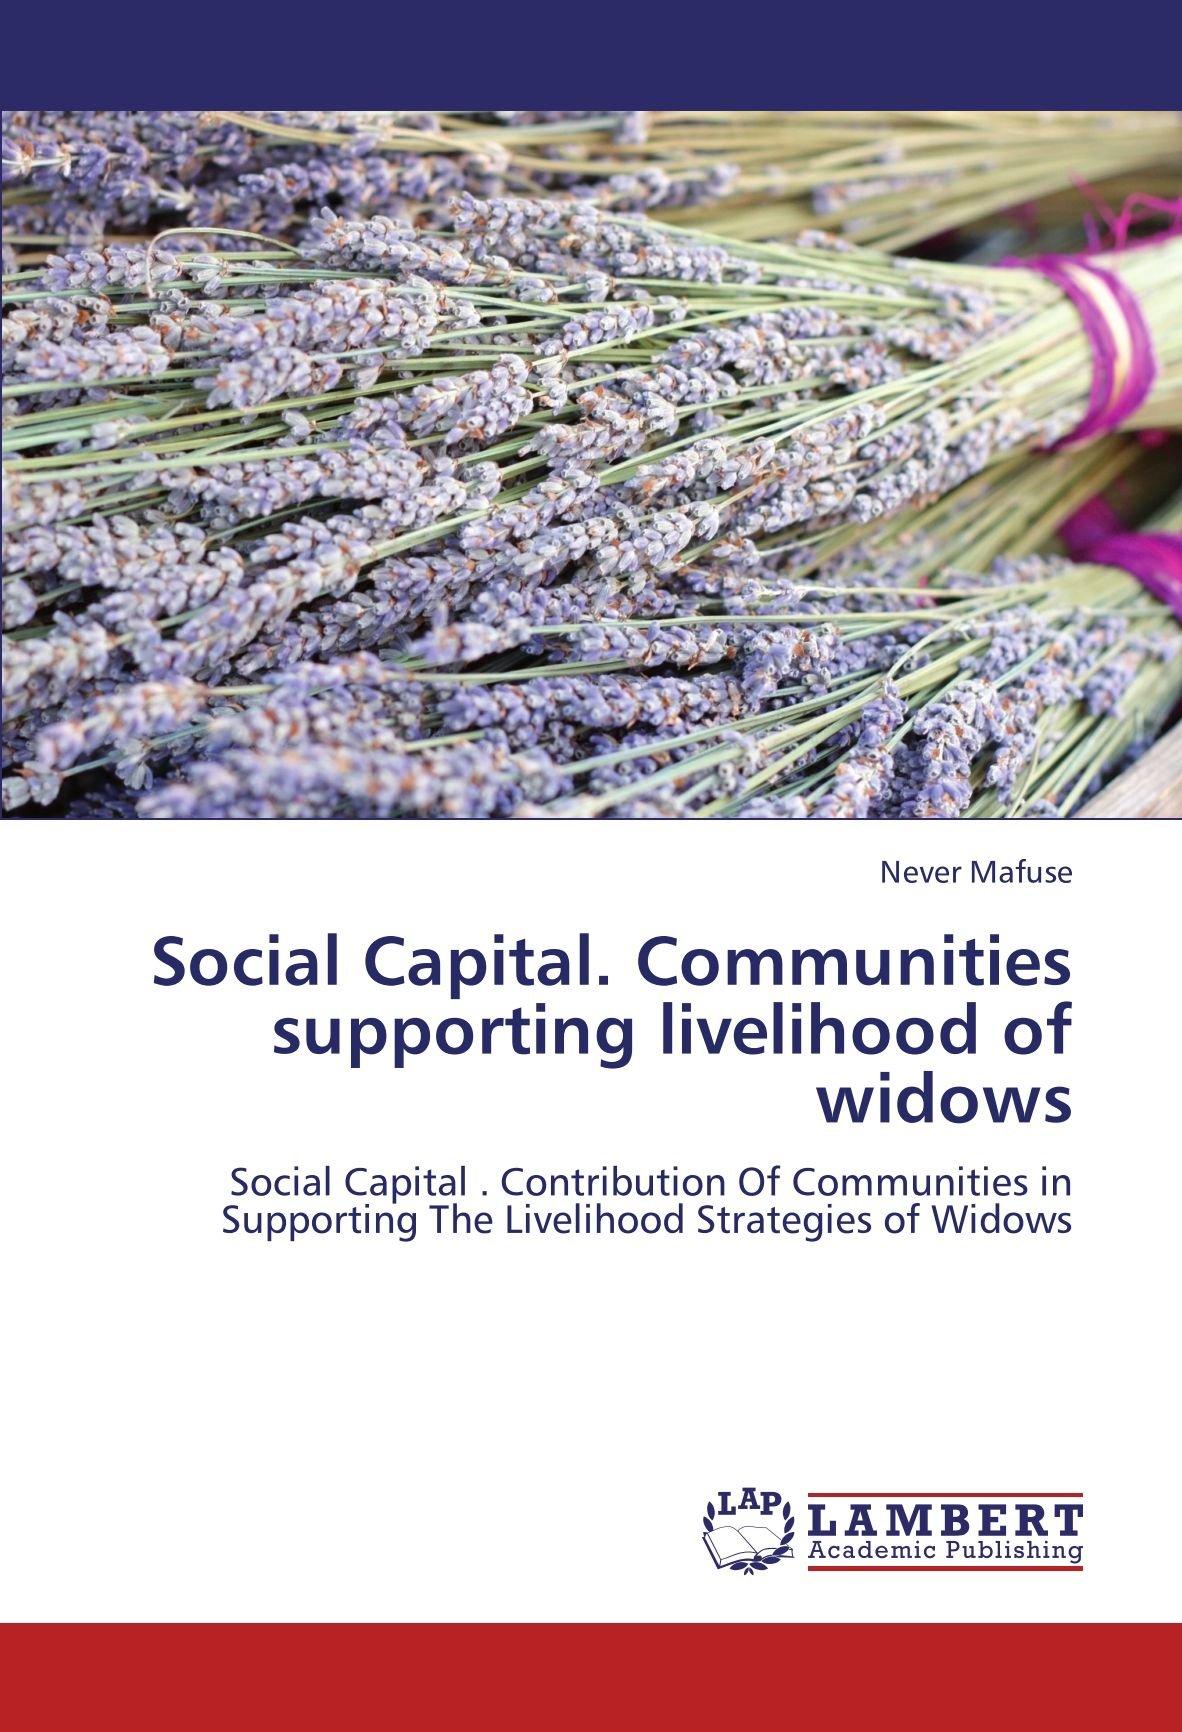 Download Social Capital. Communities  supporting livelihood  of widows: Social Capital . Contribution Of Communities in Supporting The Livelihood Strategies of Widows ebook